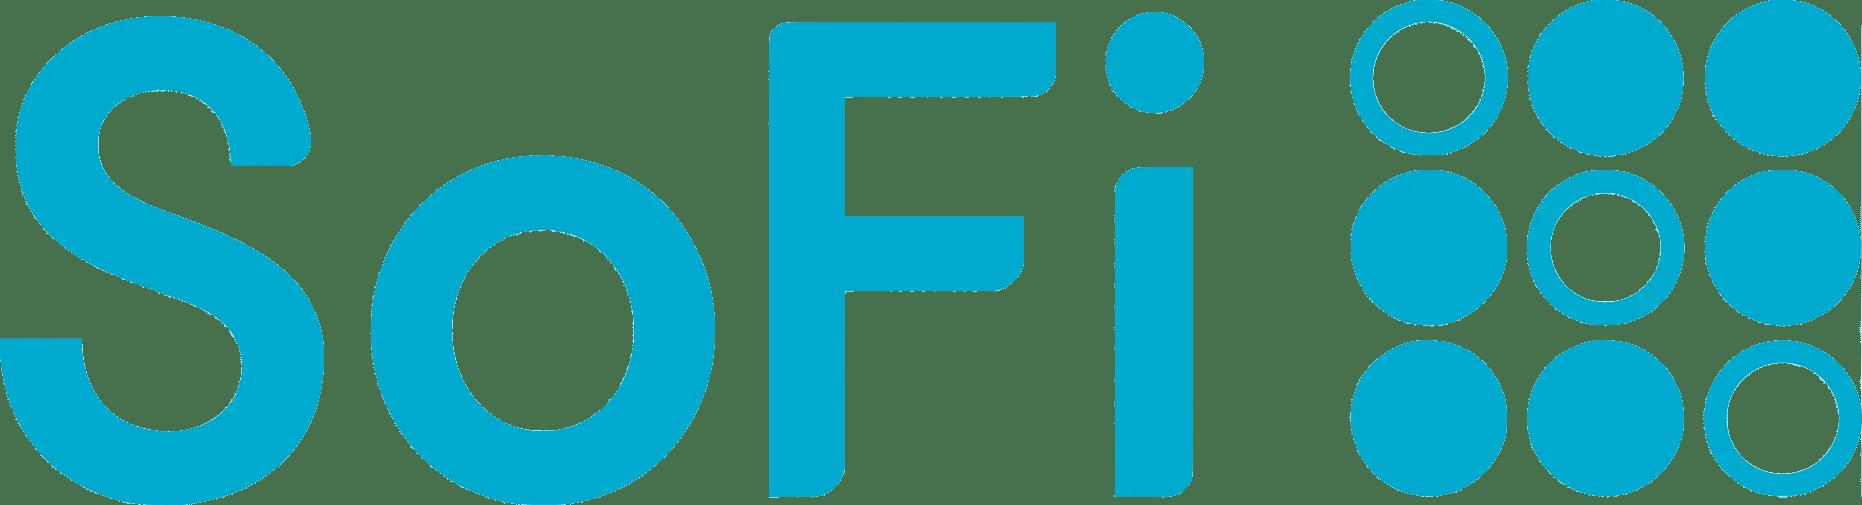 SoFi-Logo-new